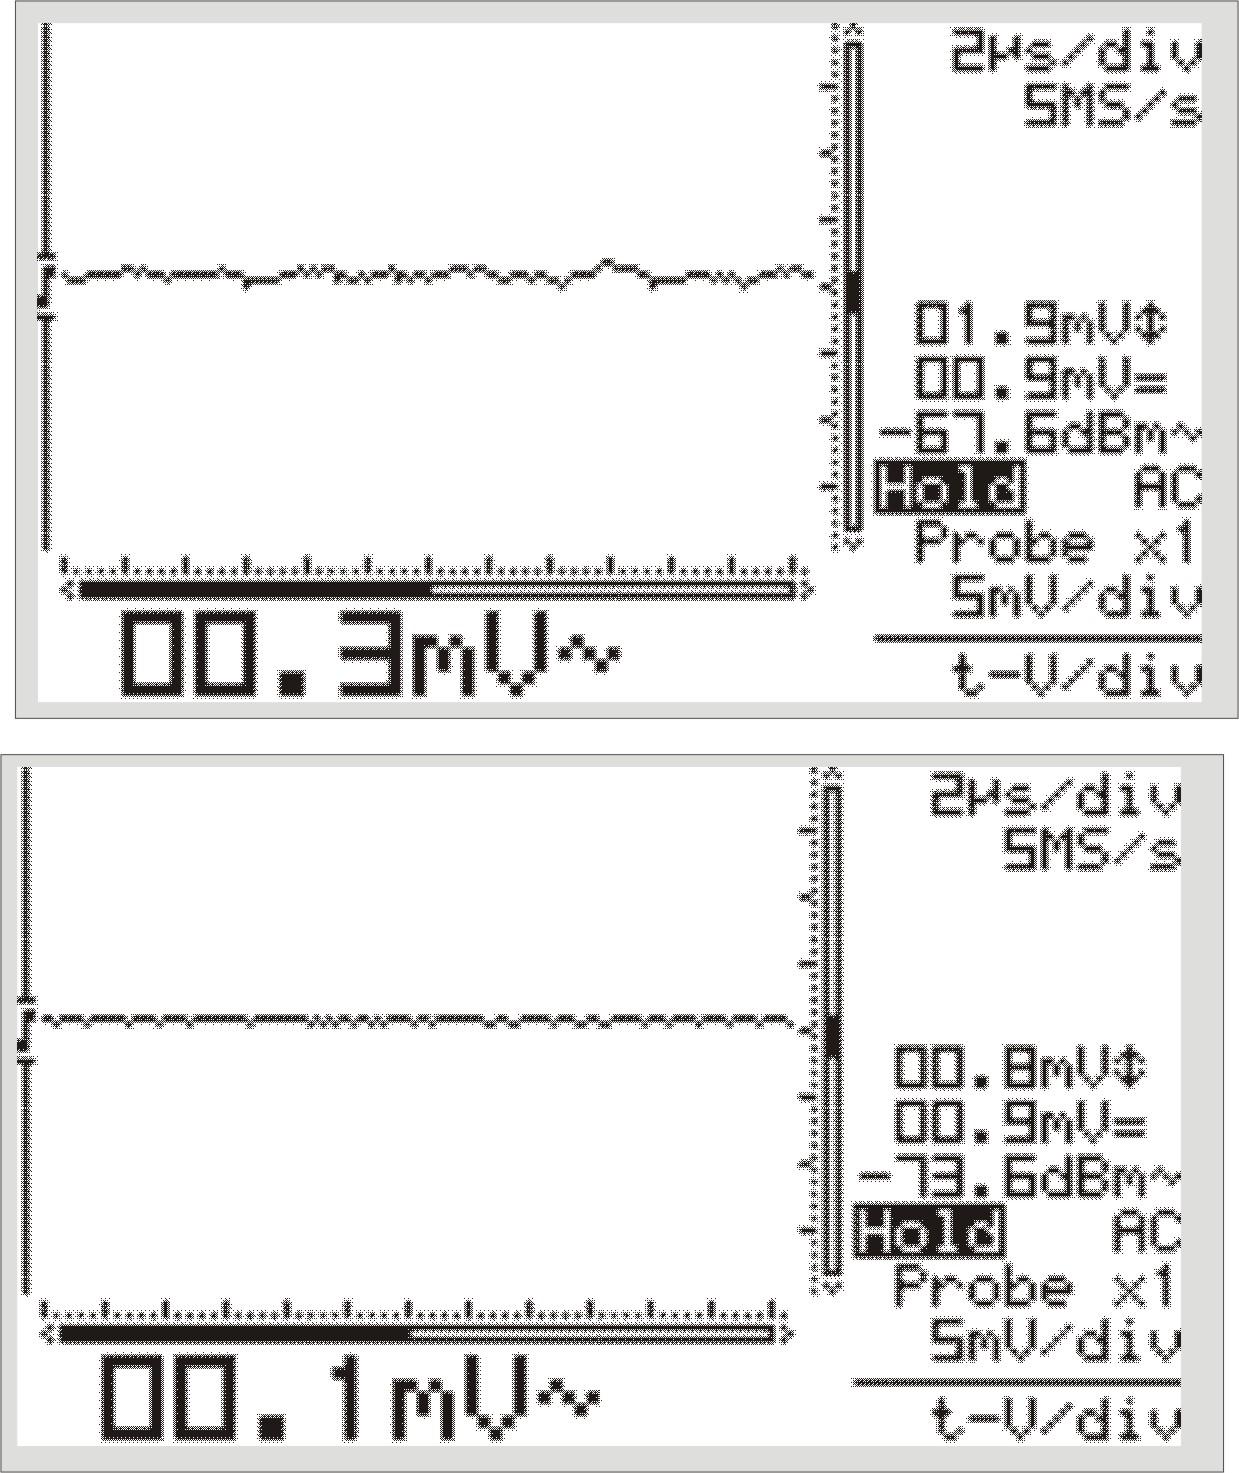 Pic En Zenerdiode Forum Circuits Online Led Circuit Calculator Http Wwwcircuitsonlinenet Download 48 Uploadarchiefnet Files Rommel2